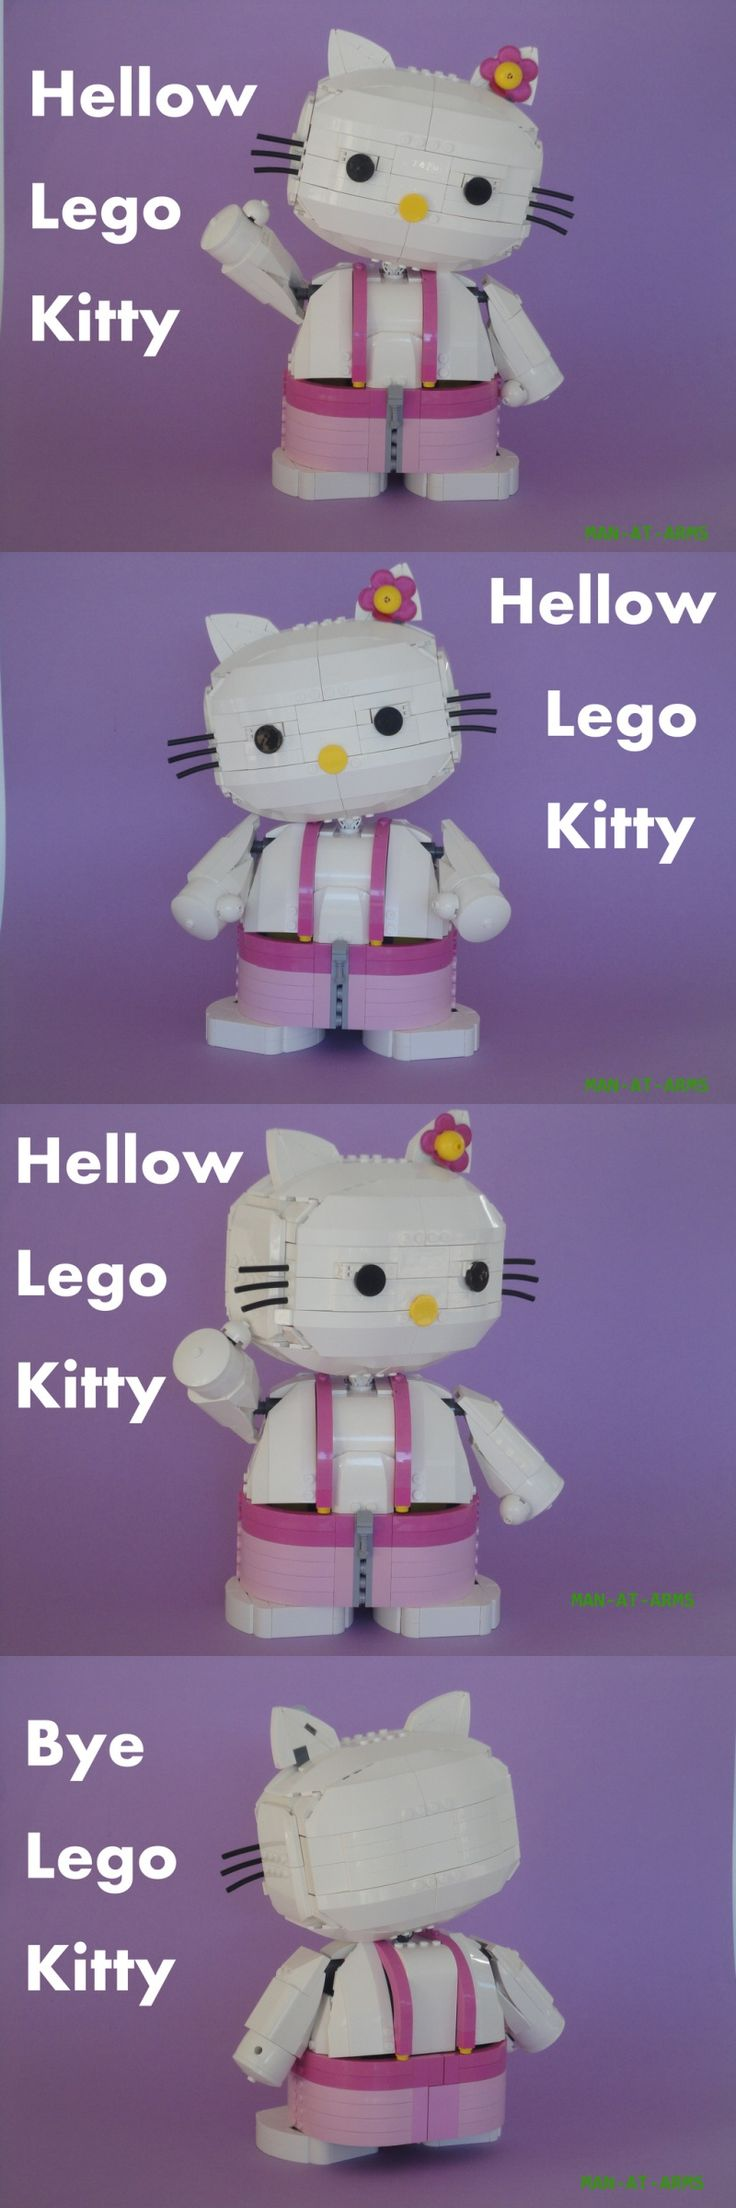 Hellolegokitty01 lego and legos - Lego hello kitty maison ...